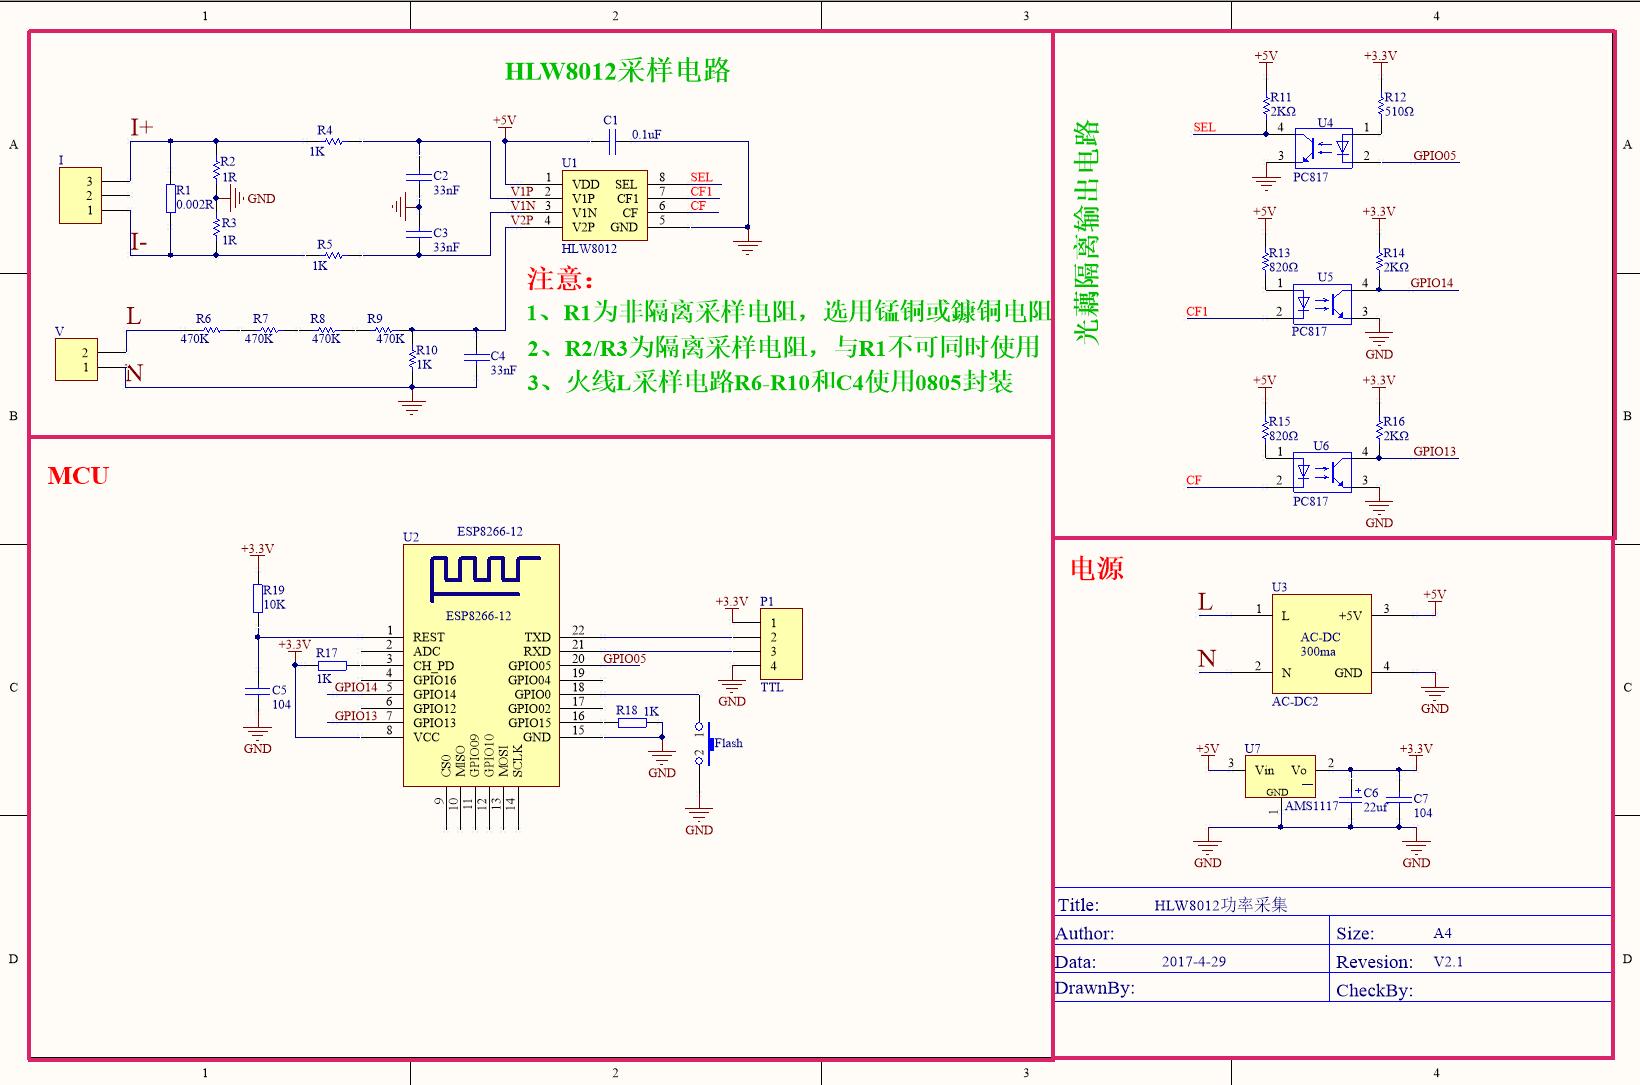 HLW8012_sch.png